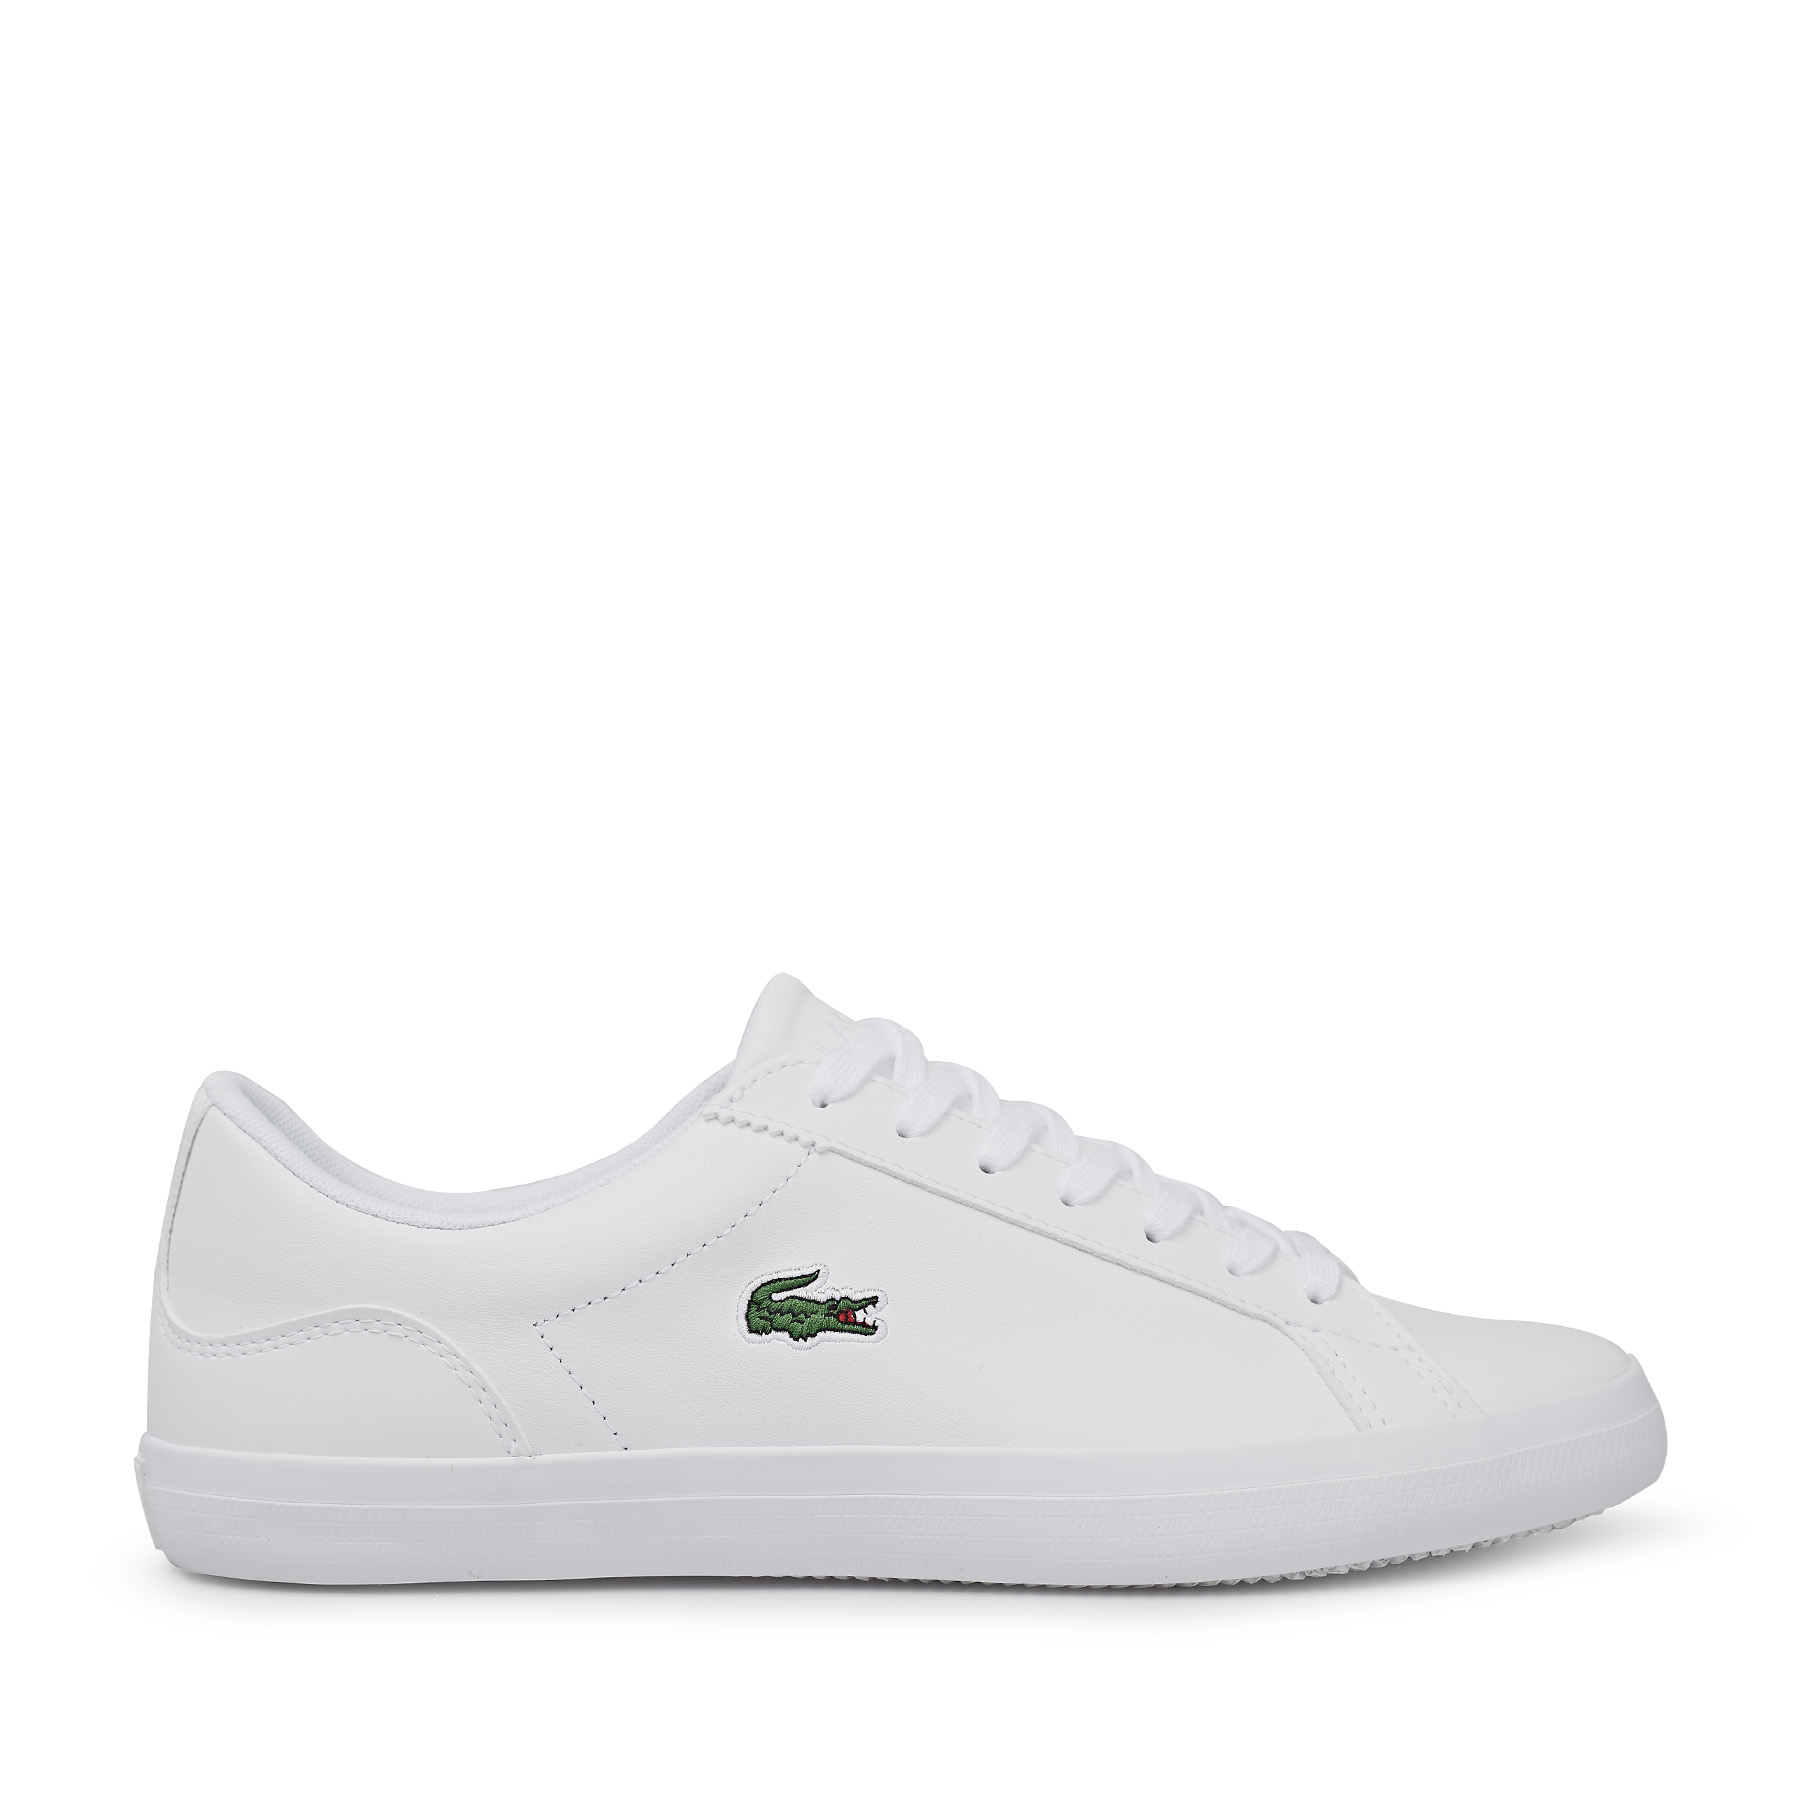 Lacoste-zapatos Para Hombre 733 CAM1032 001